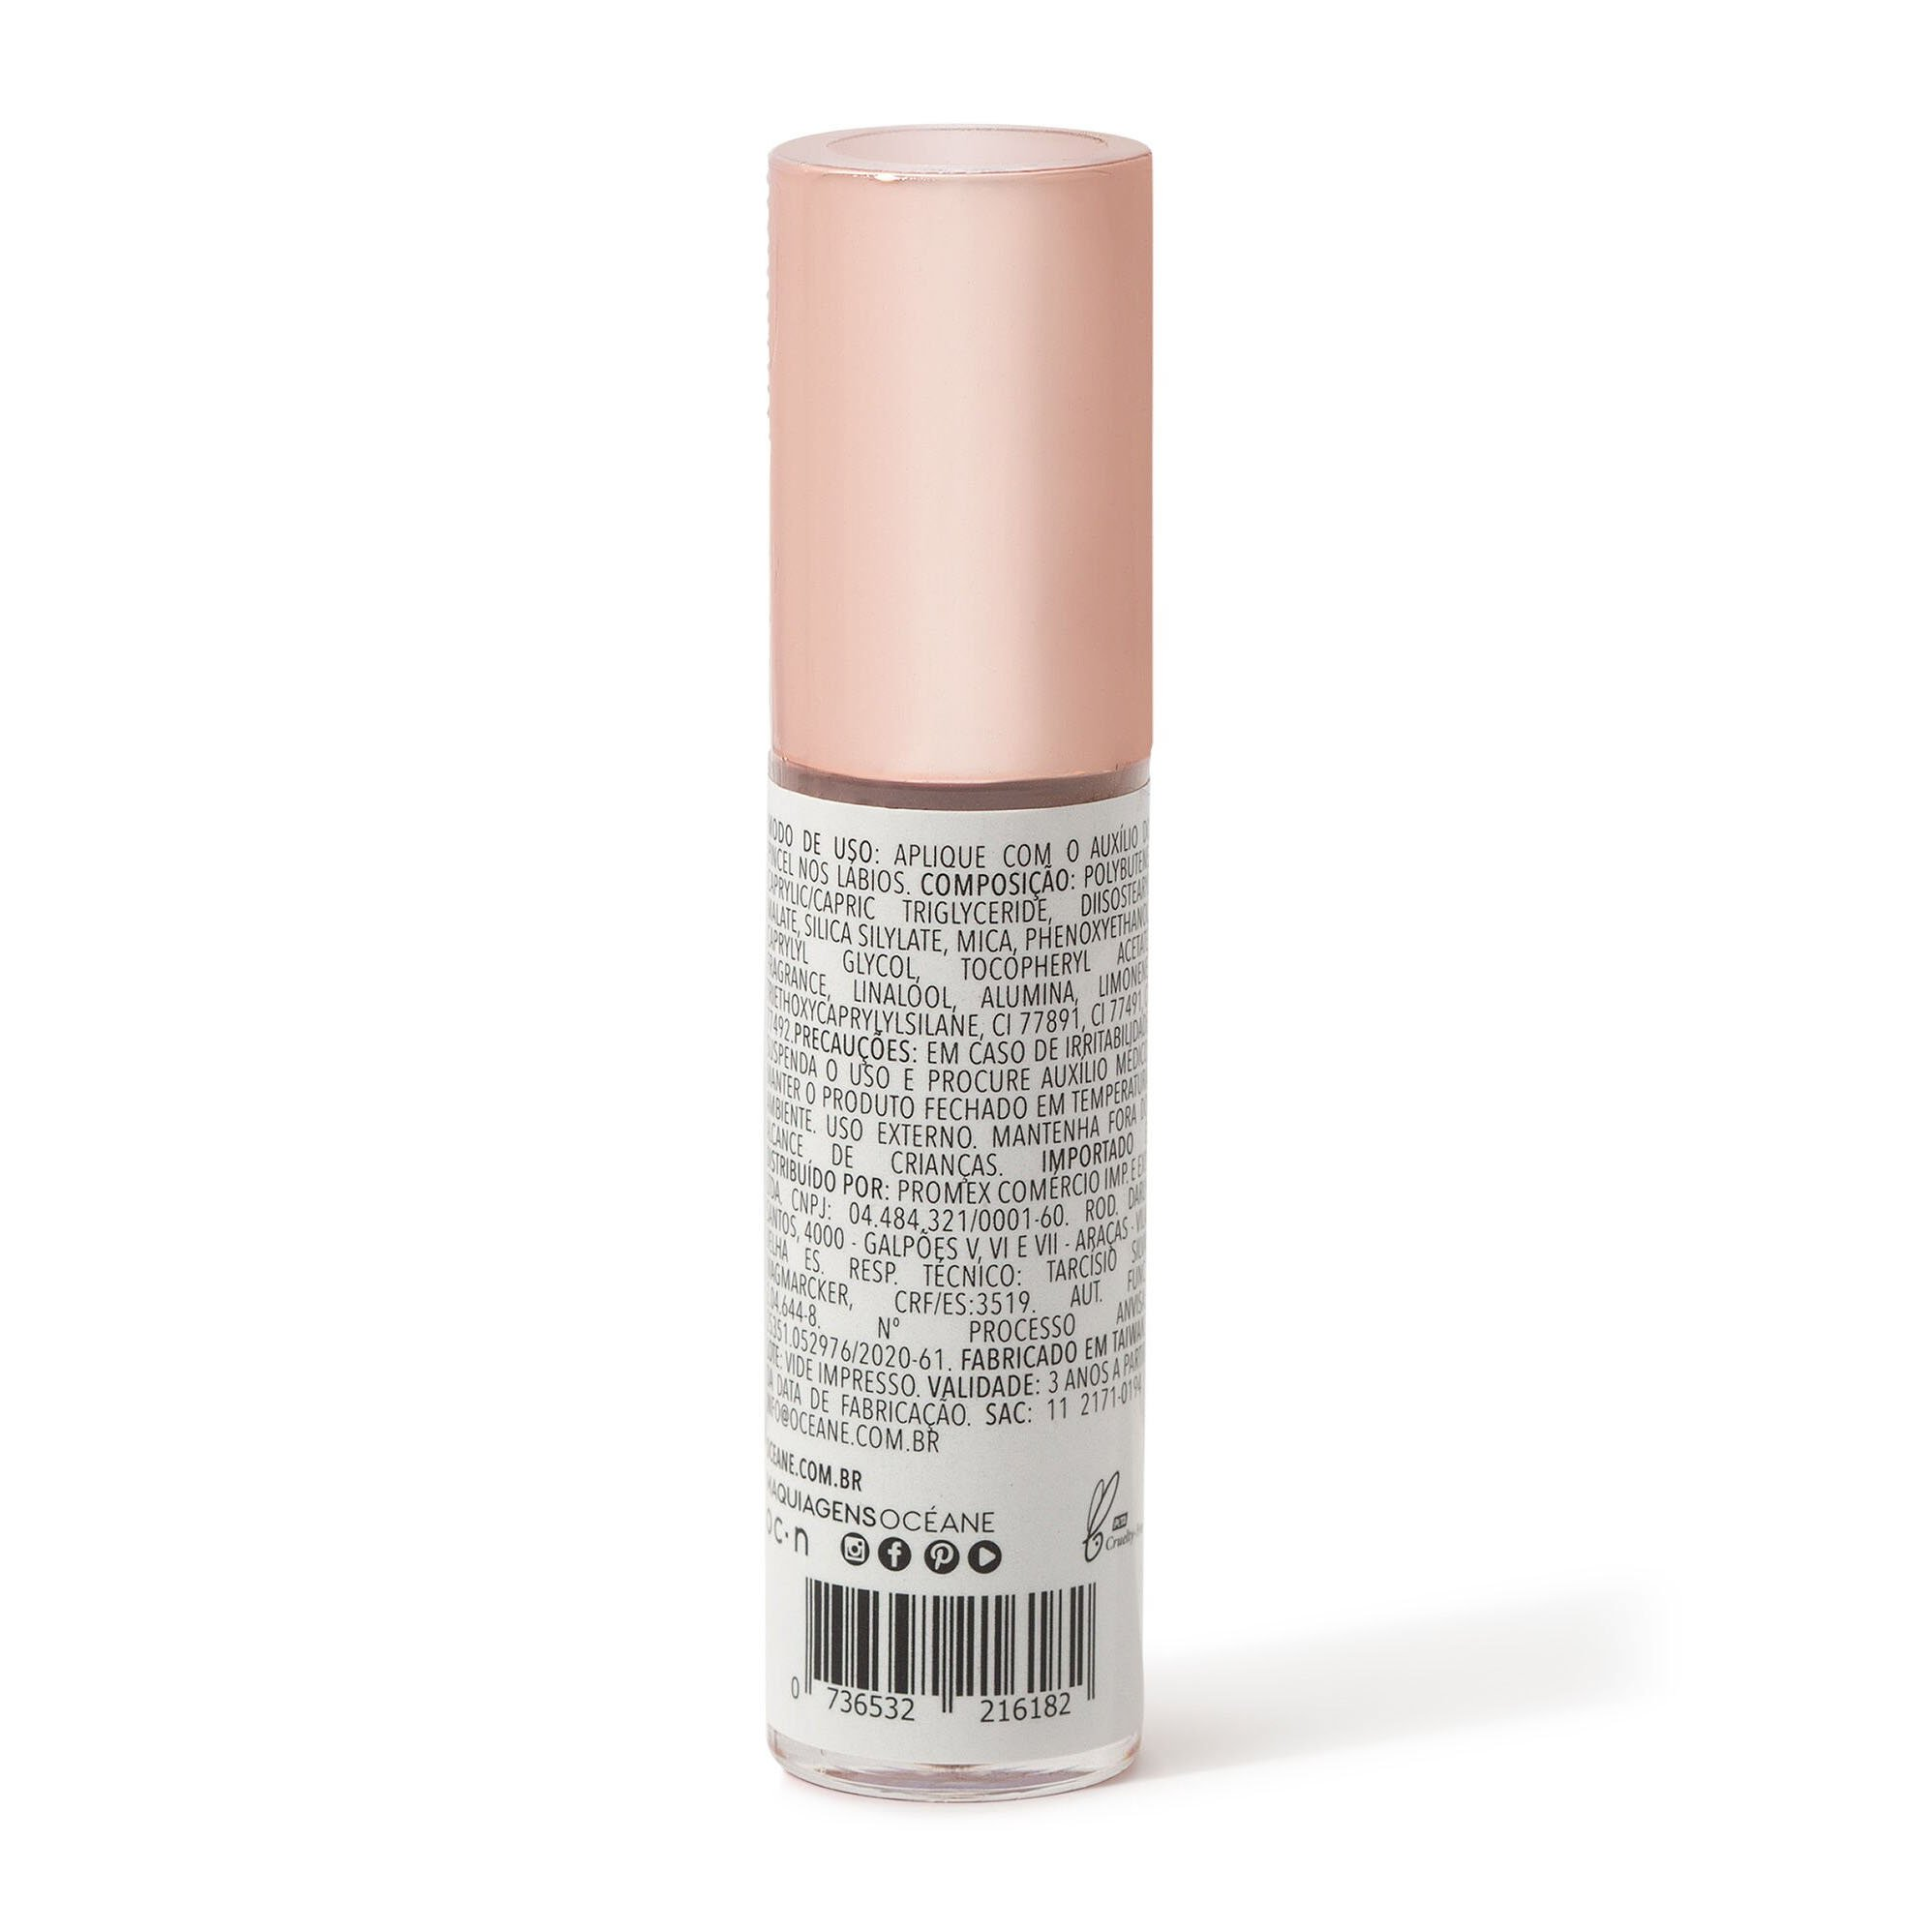 brilho labial by oceane mariana saad nude 51073 2000 203227 3